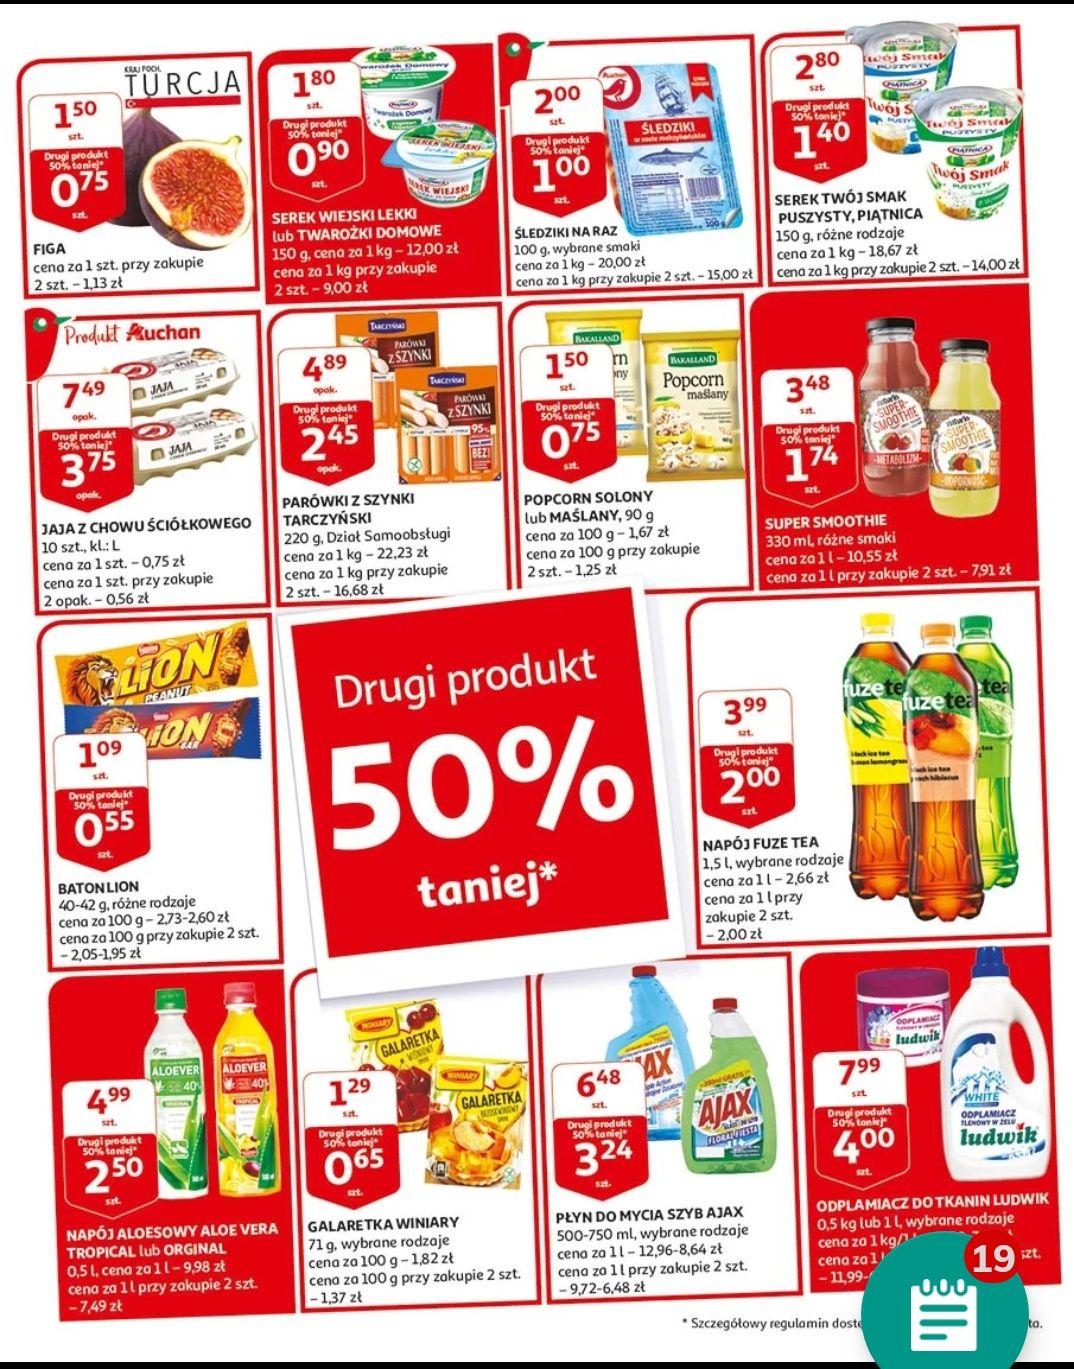 Auchan promo druga sztuka 50% off